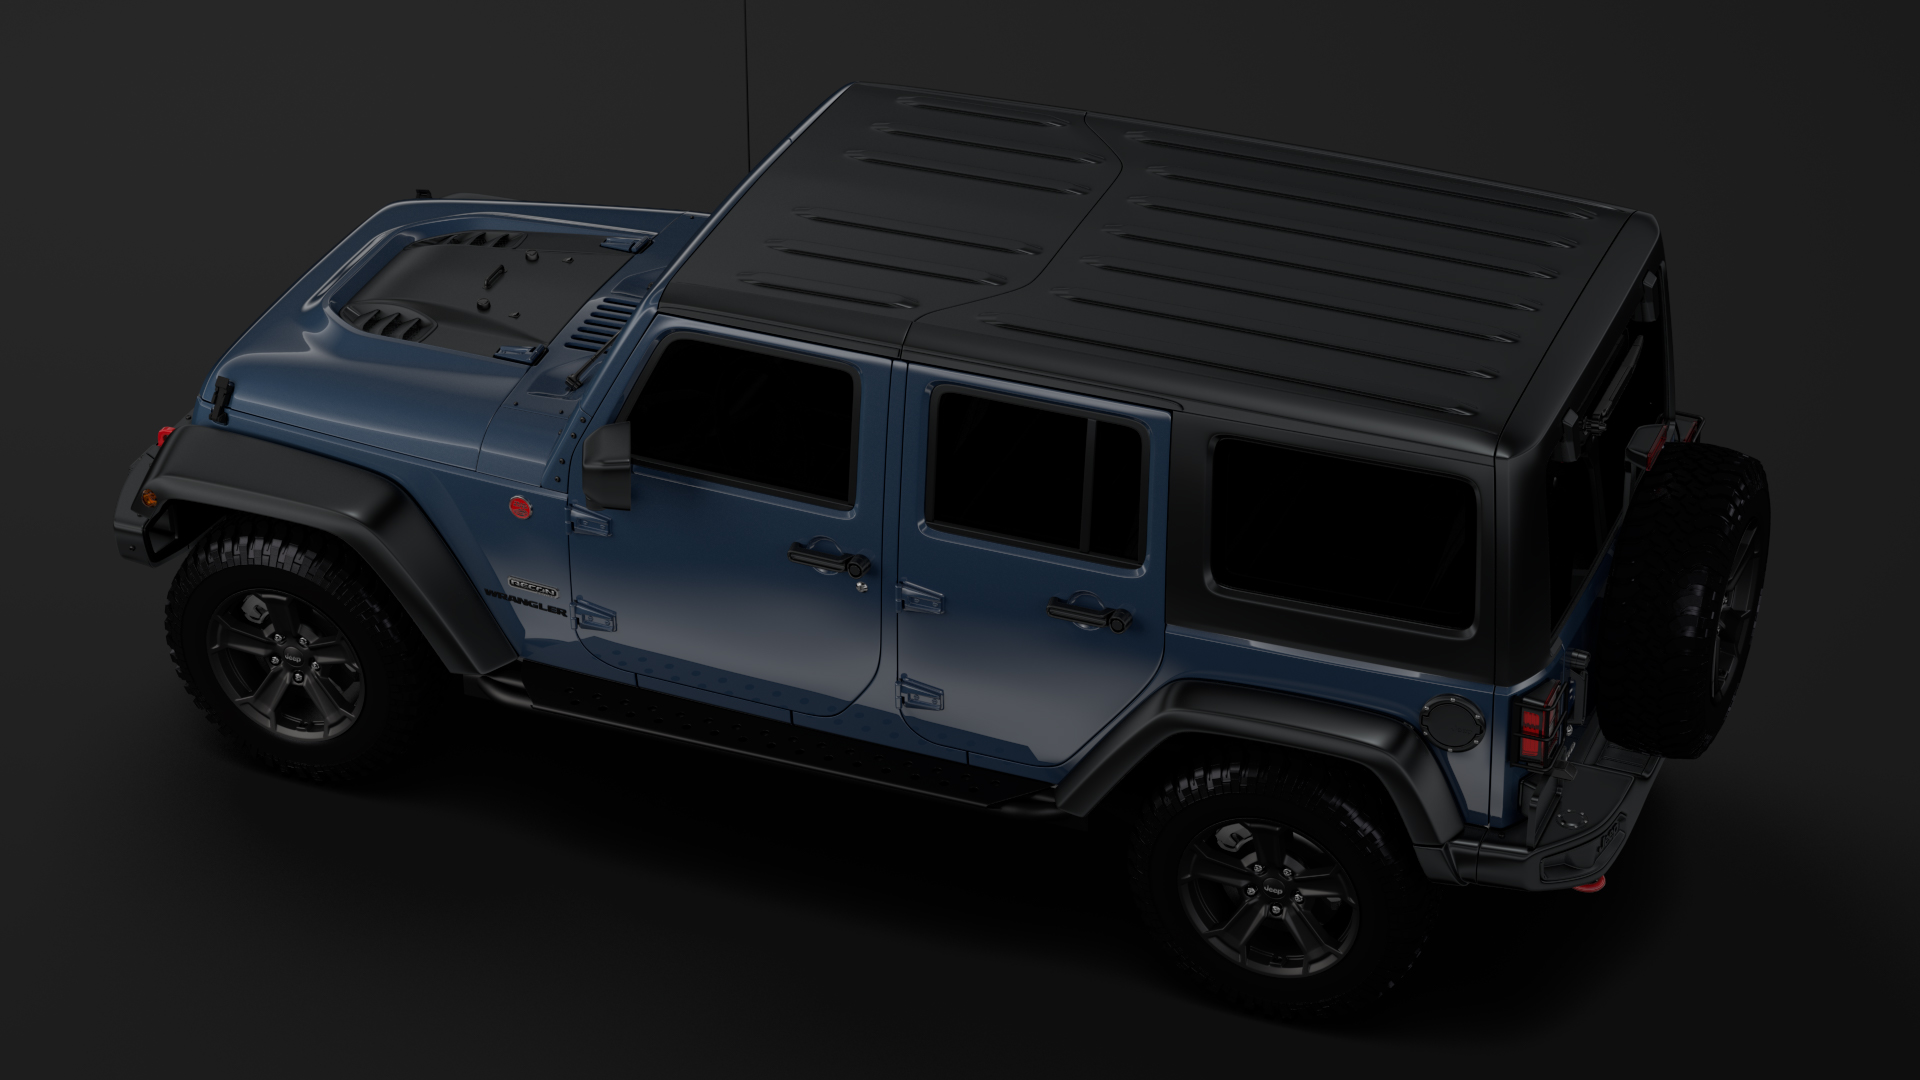 jeep wrangler unlimited rubicon recon jk 2017 3d model max fbx c4d lwo ma mb hrc xsi obj 277007